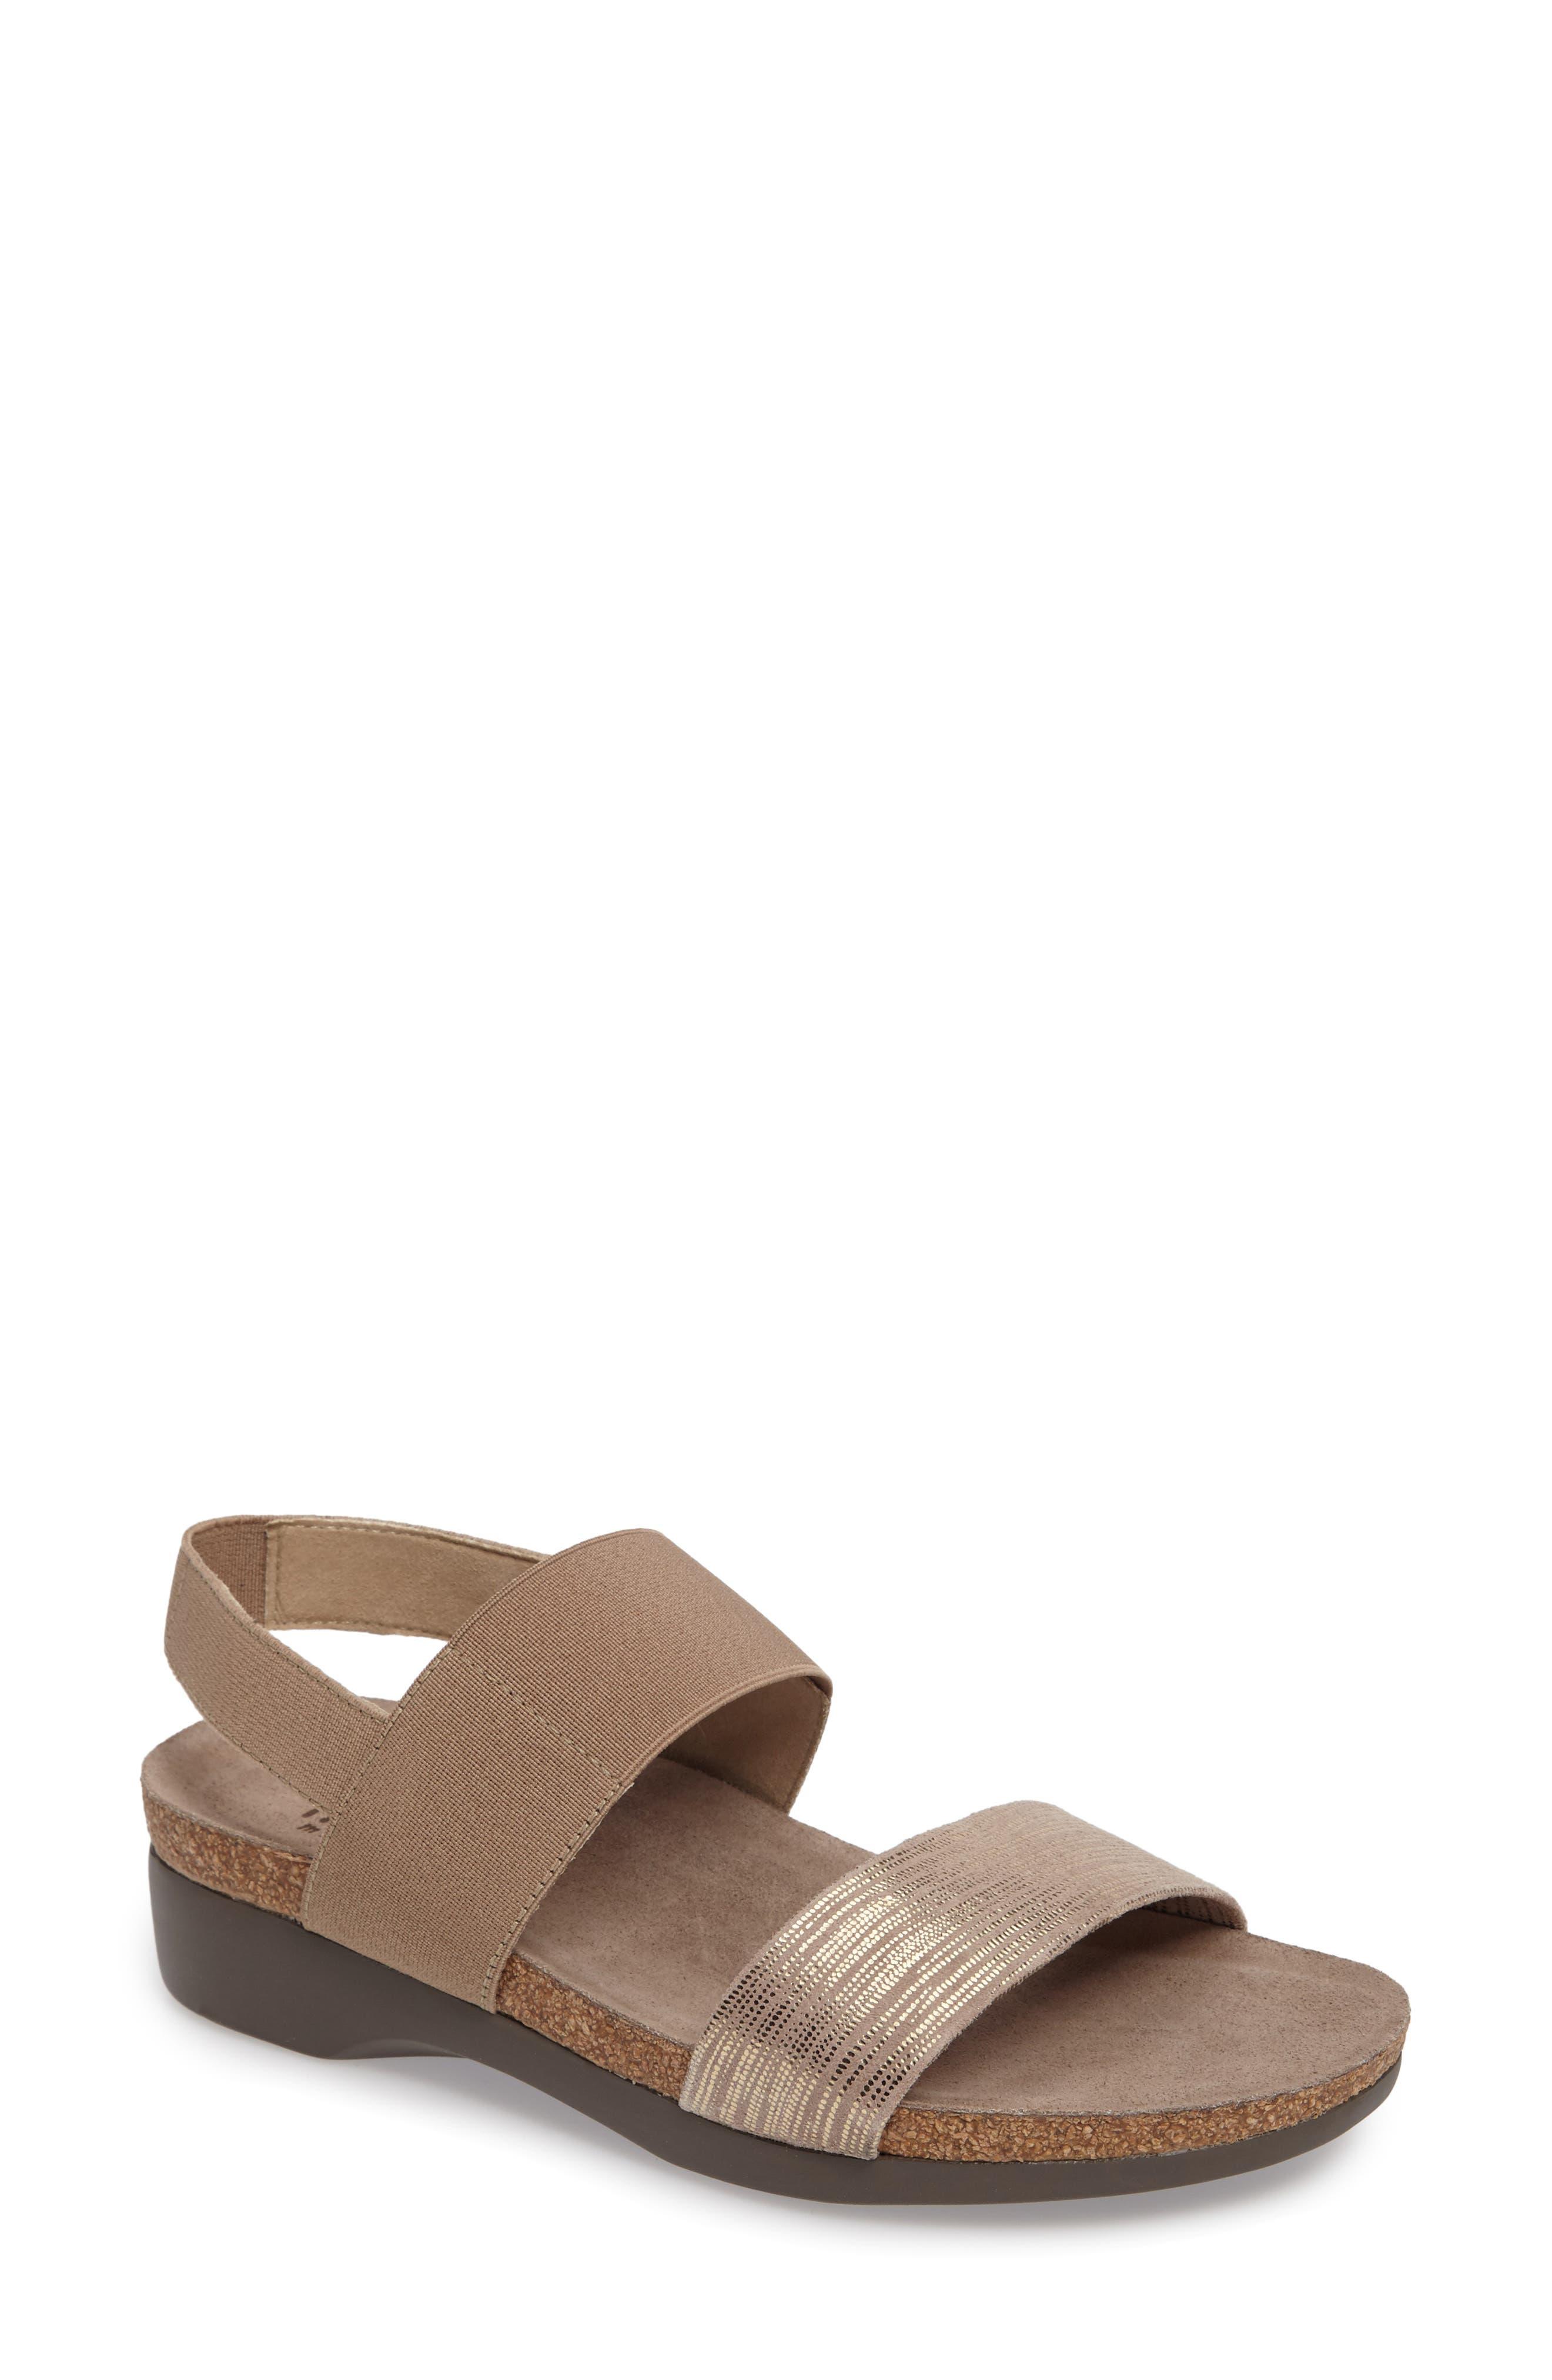 Main Image - Munro 'Pisces' Sandal